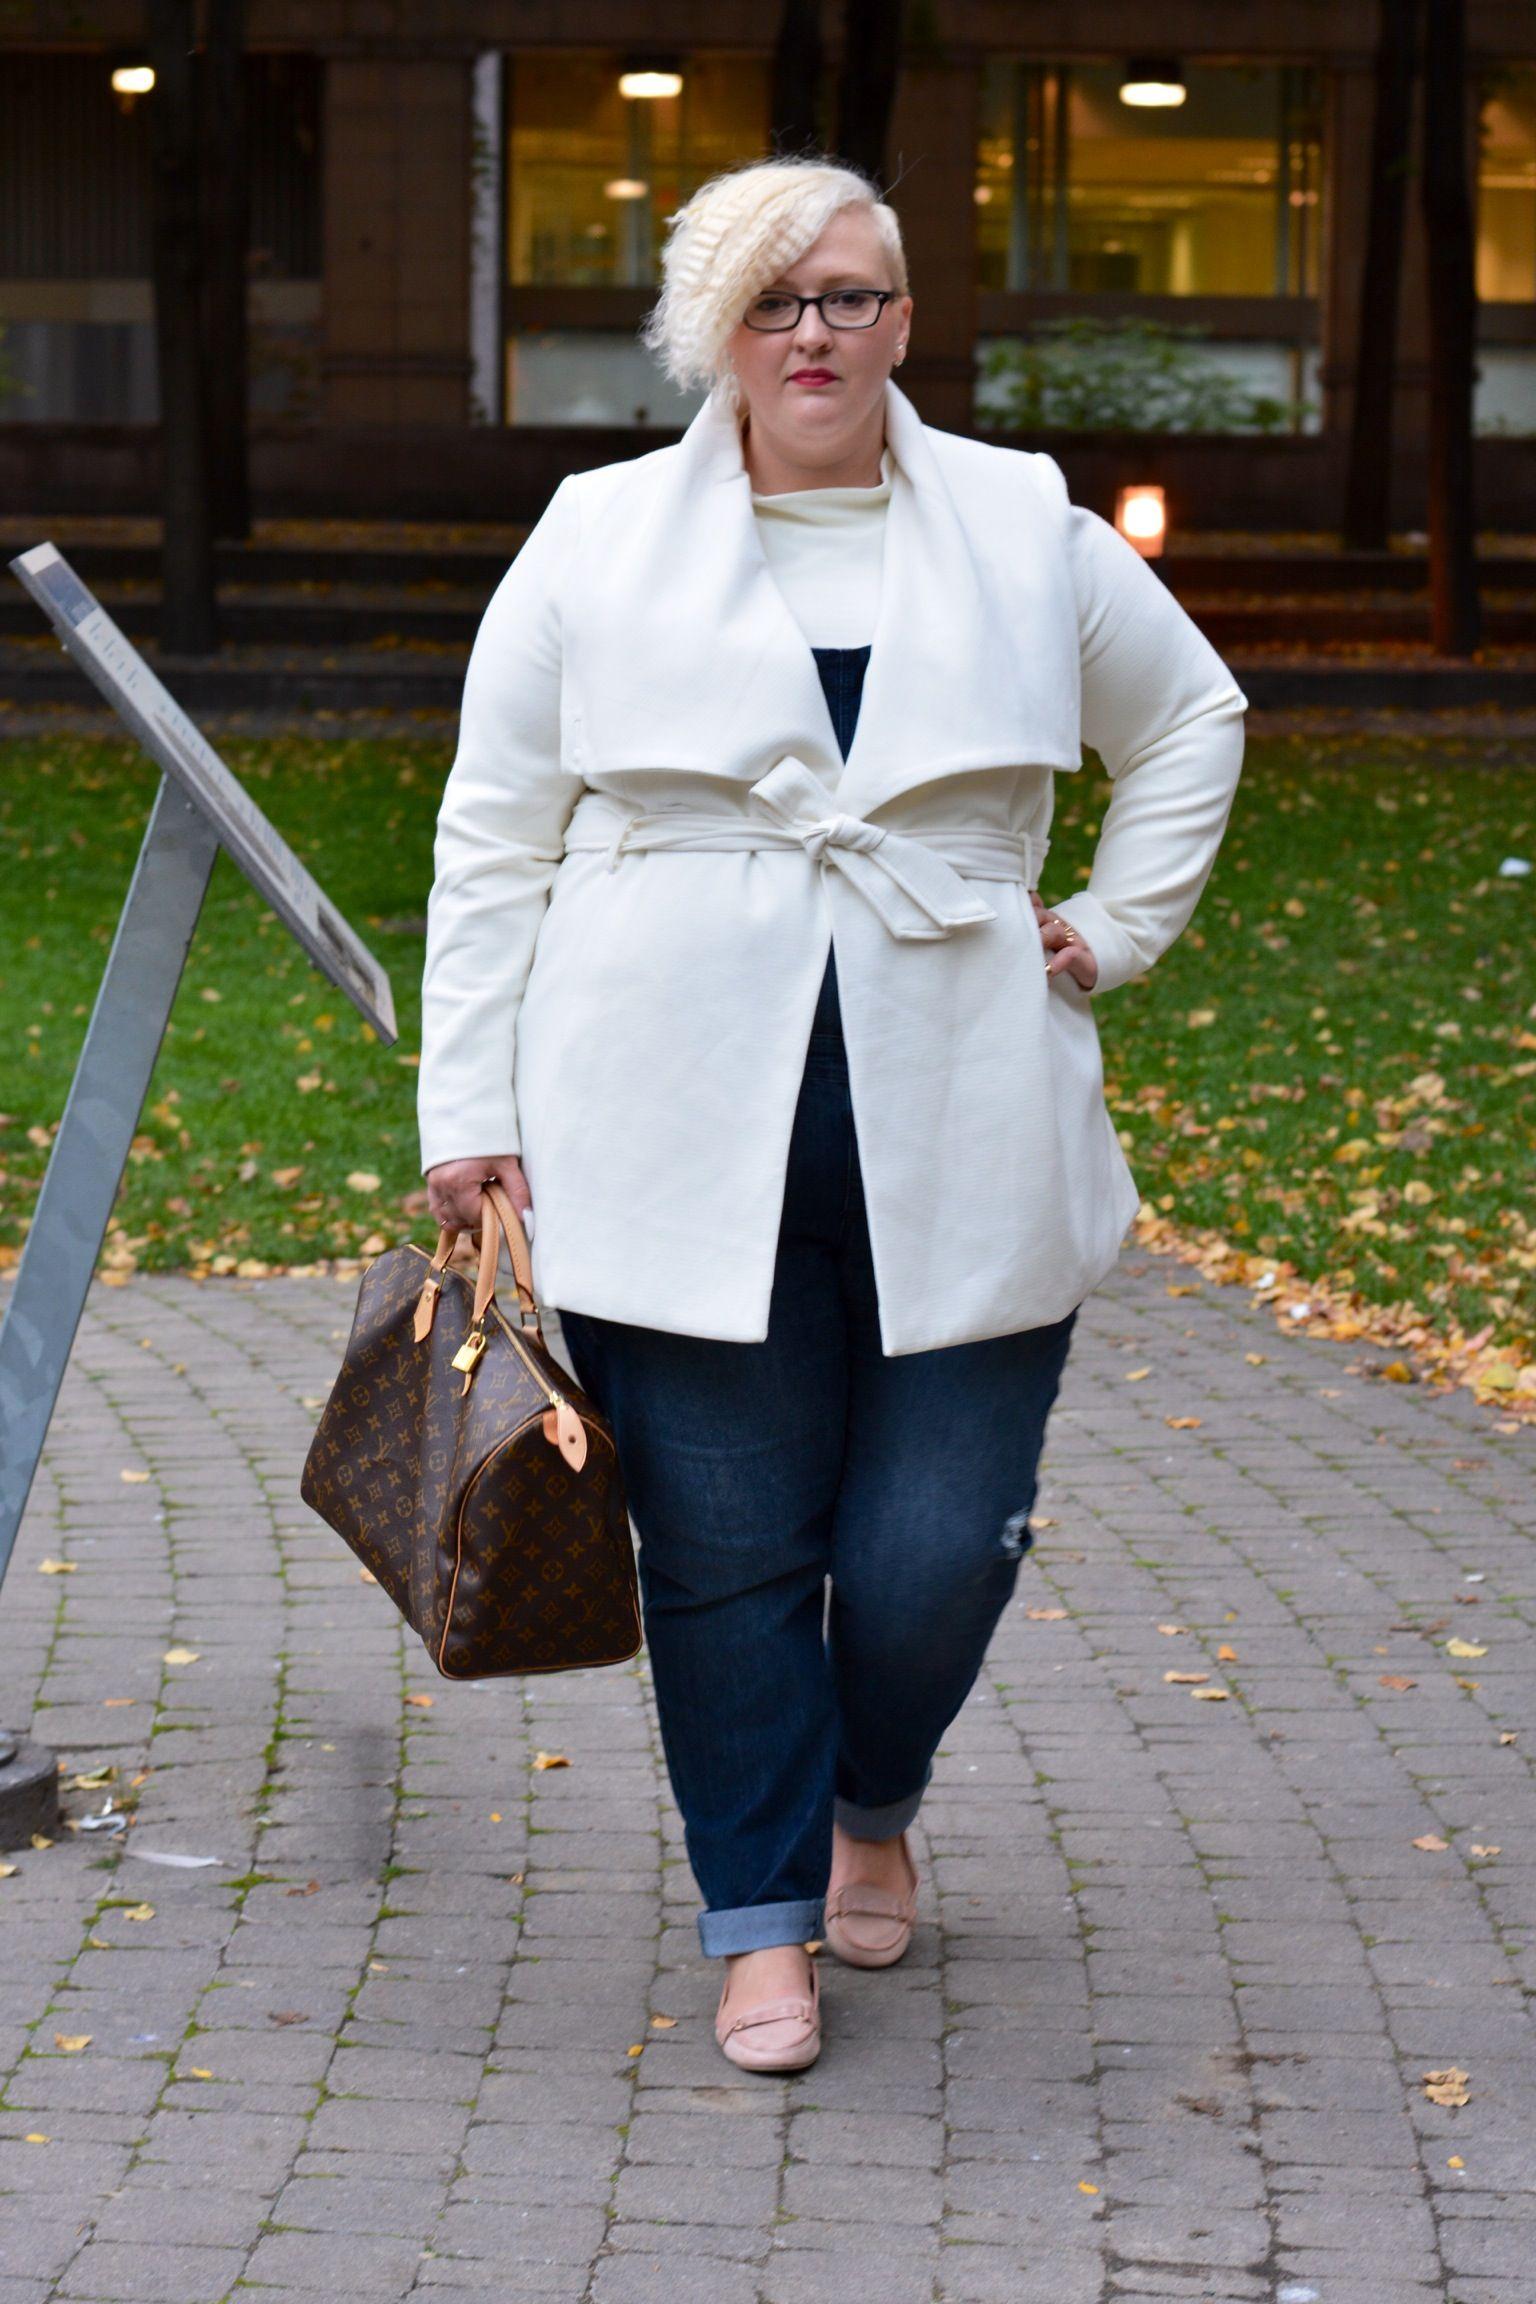 b28d4dbaf3 Fashion Blogger Spotlight  Cynthia of Flight of the Fat Girl